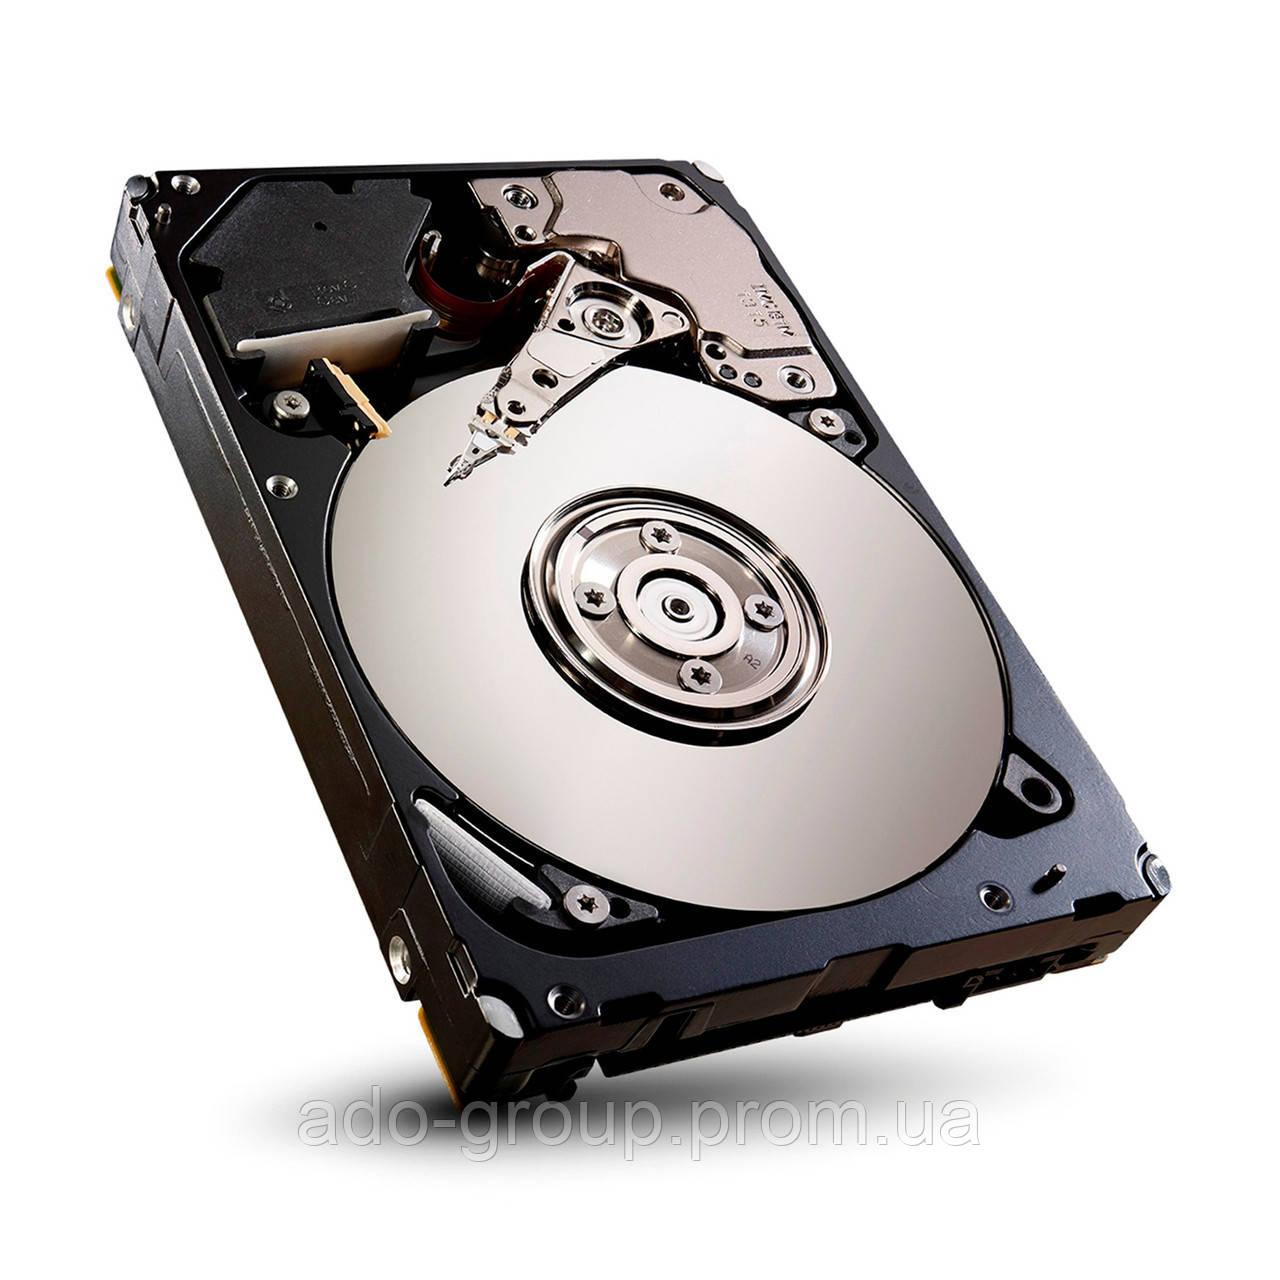 "W7MXW Жесткий диск Dell 300Gb SAS 15K  2.5"" +"